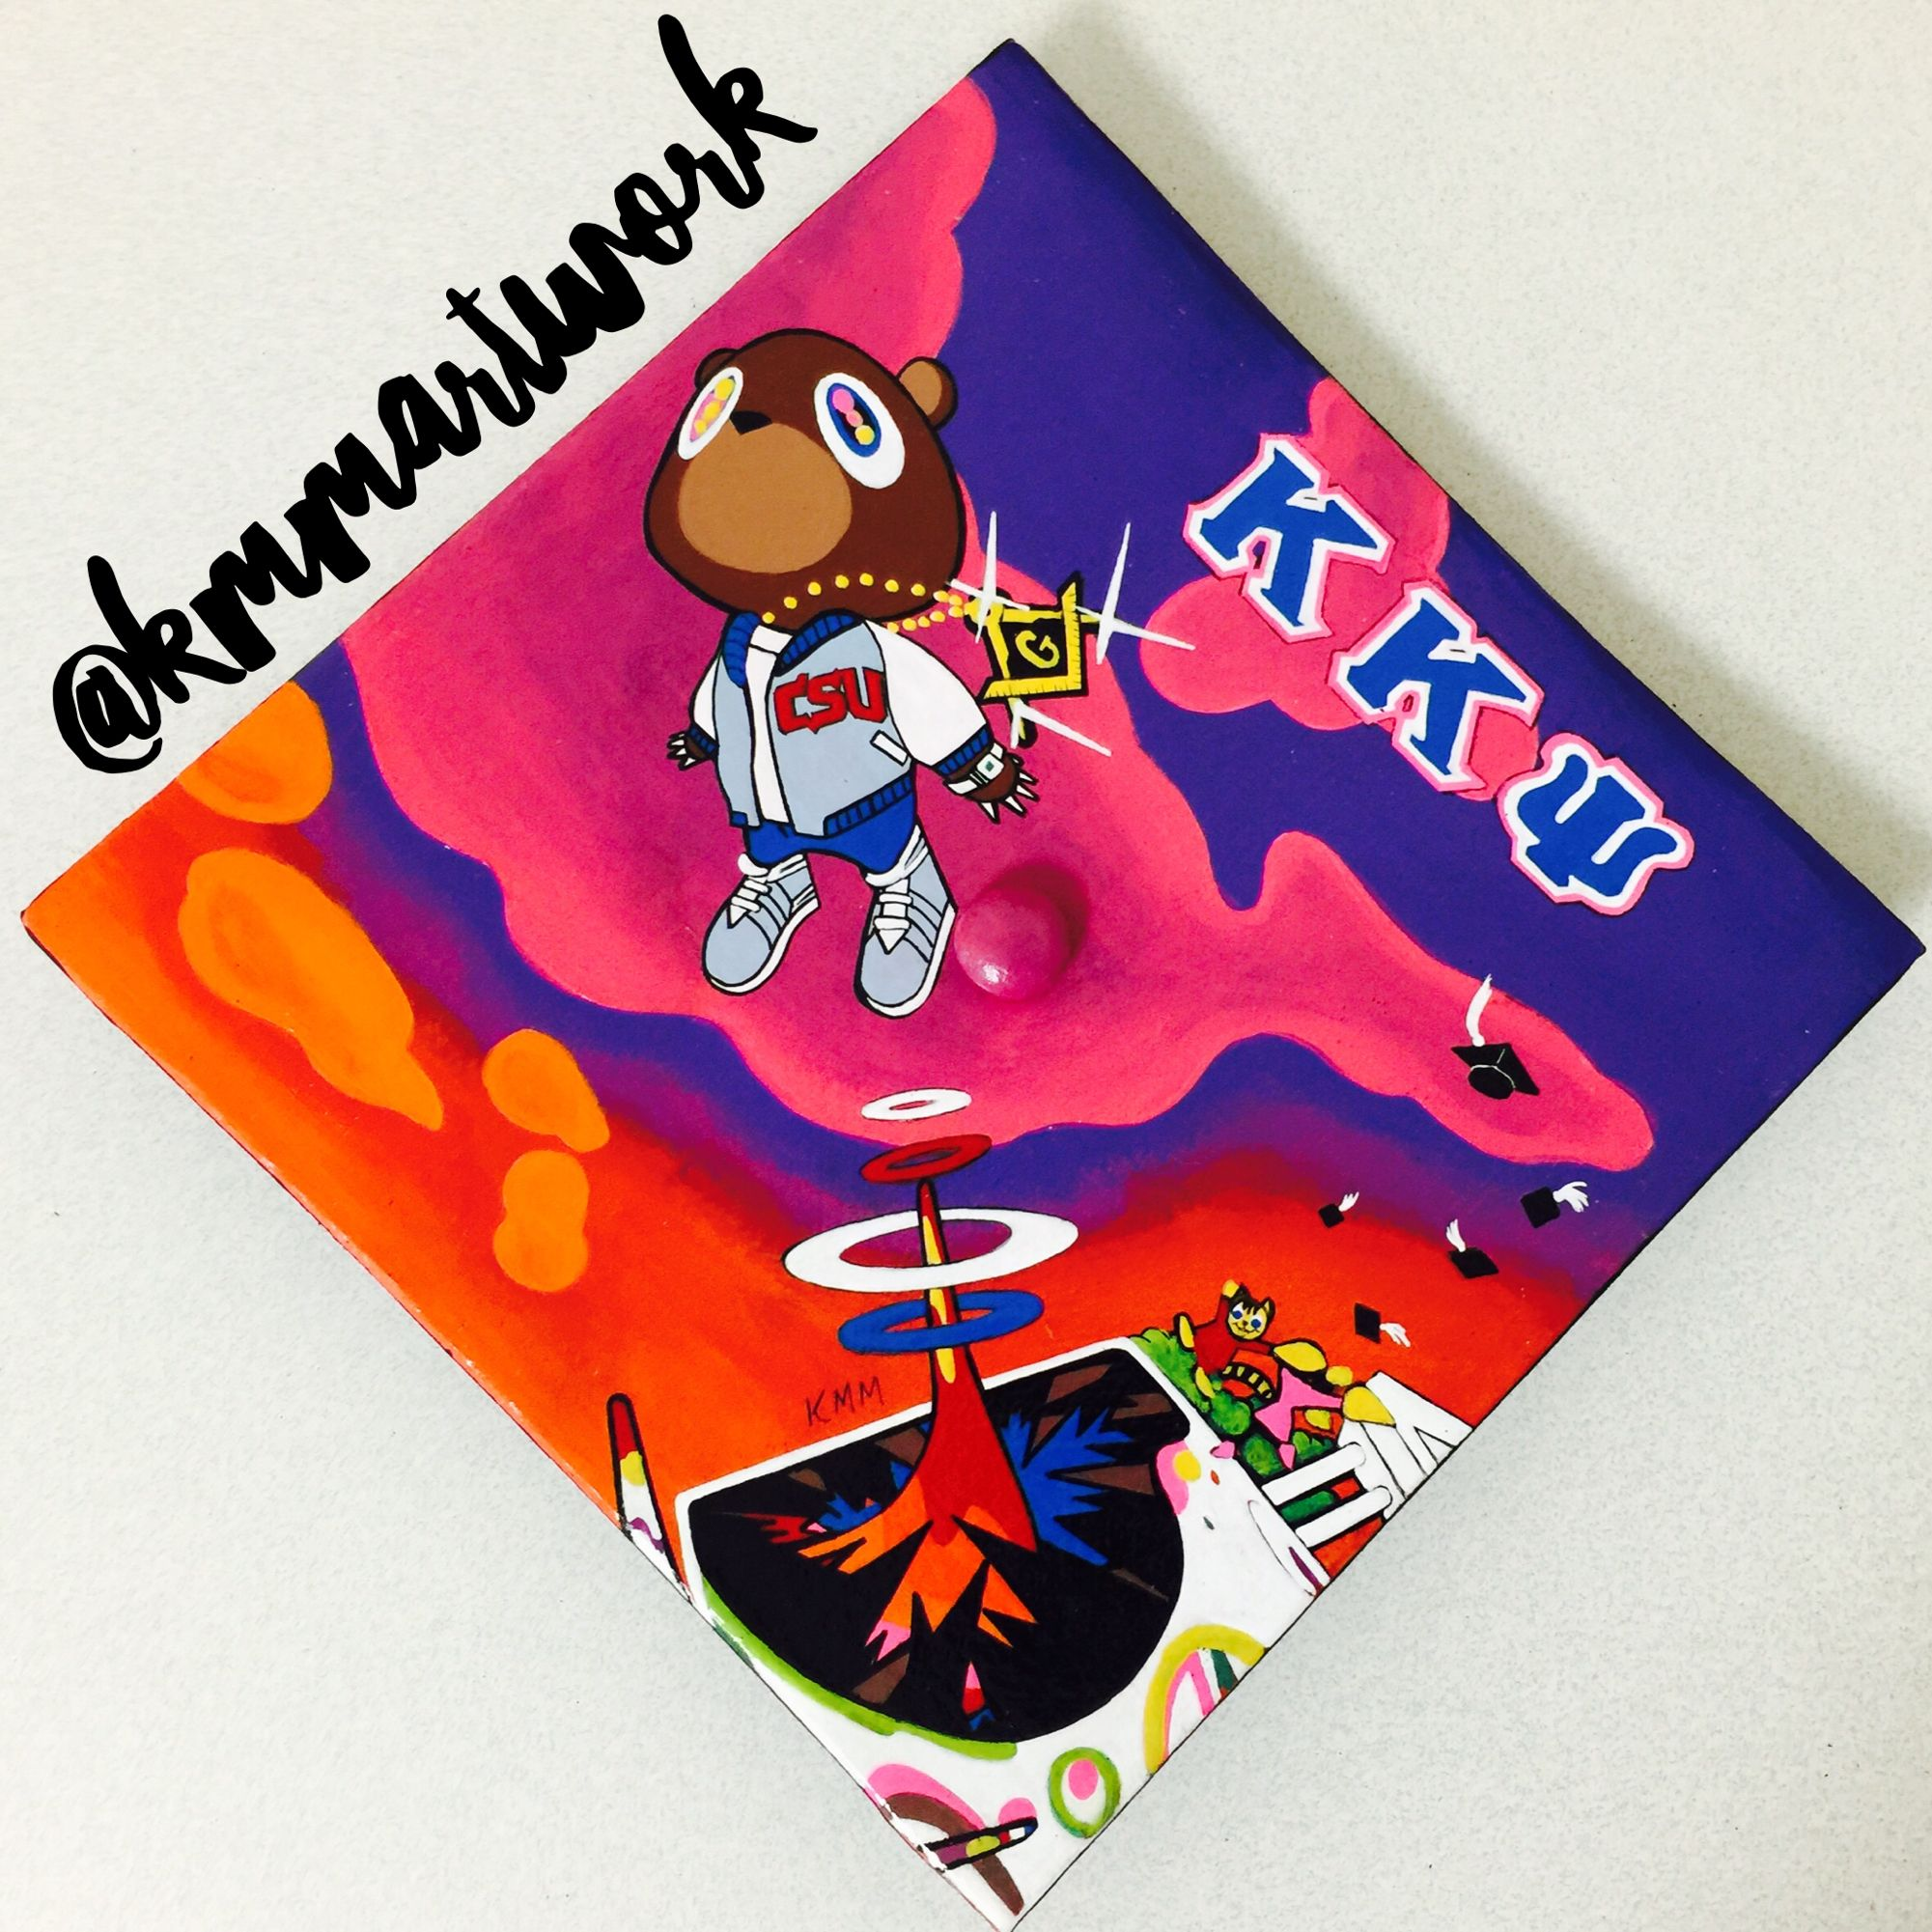 Graduation Cap Kanye West Graduation Album Cover University Of Houston Kmm Artwork Ha Graduation Album Graduation Cap Drawing Kanye West Graduation Cap